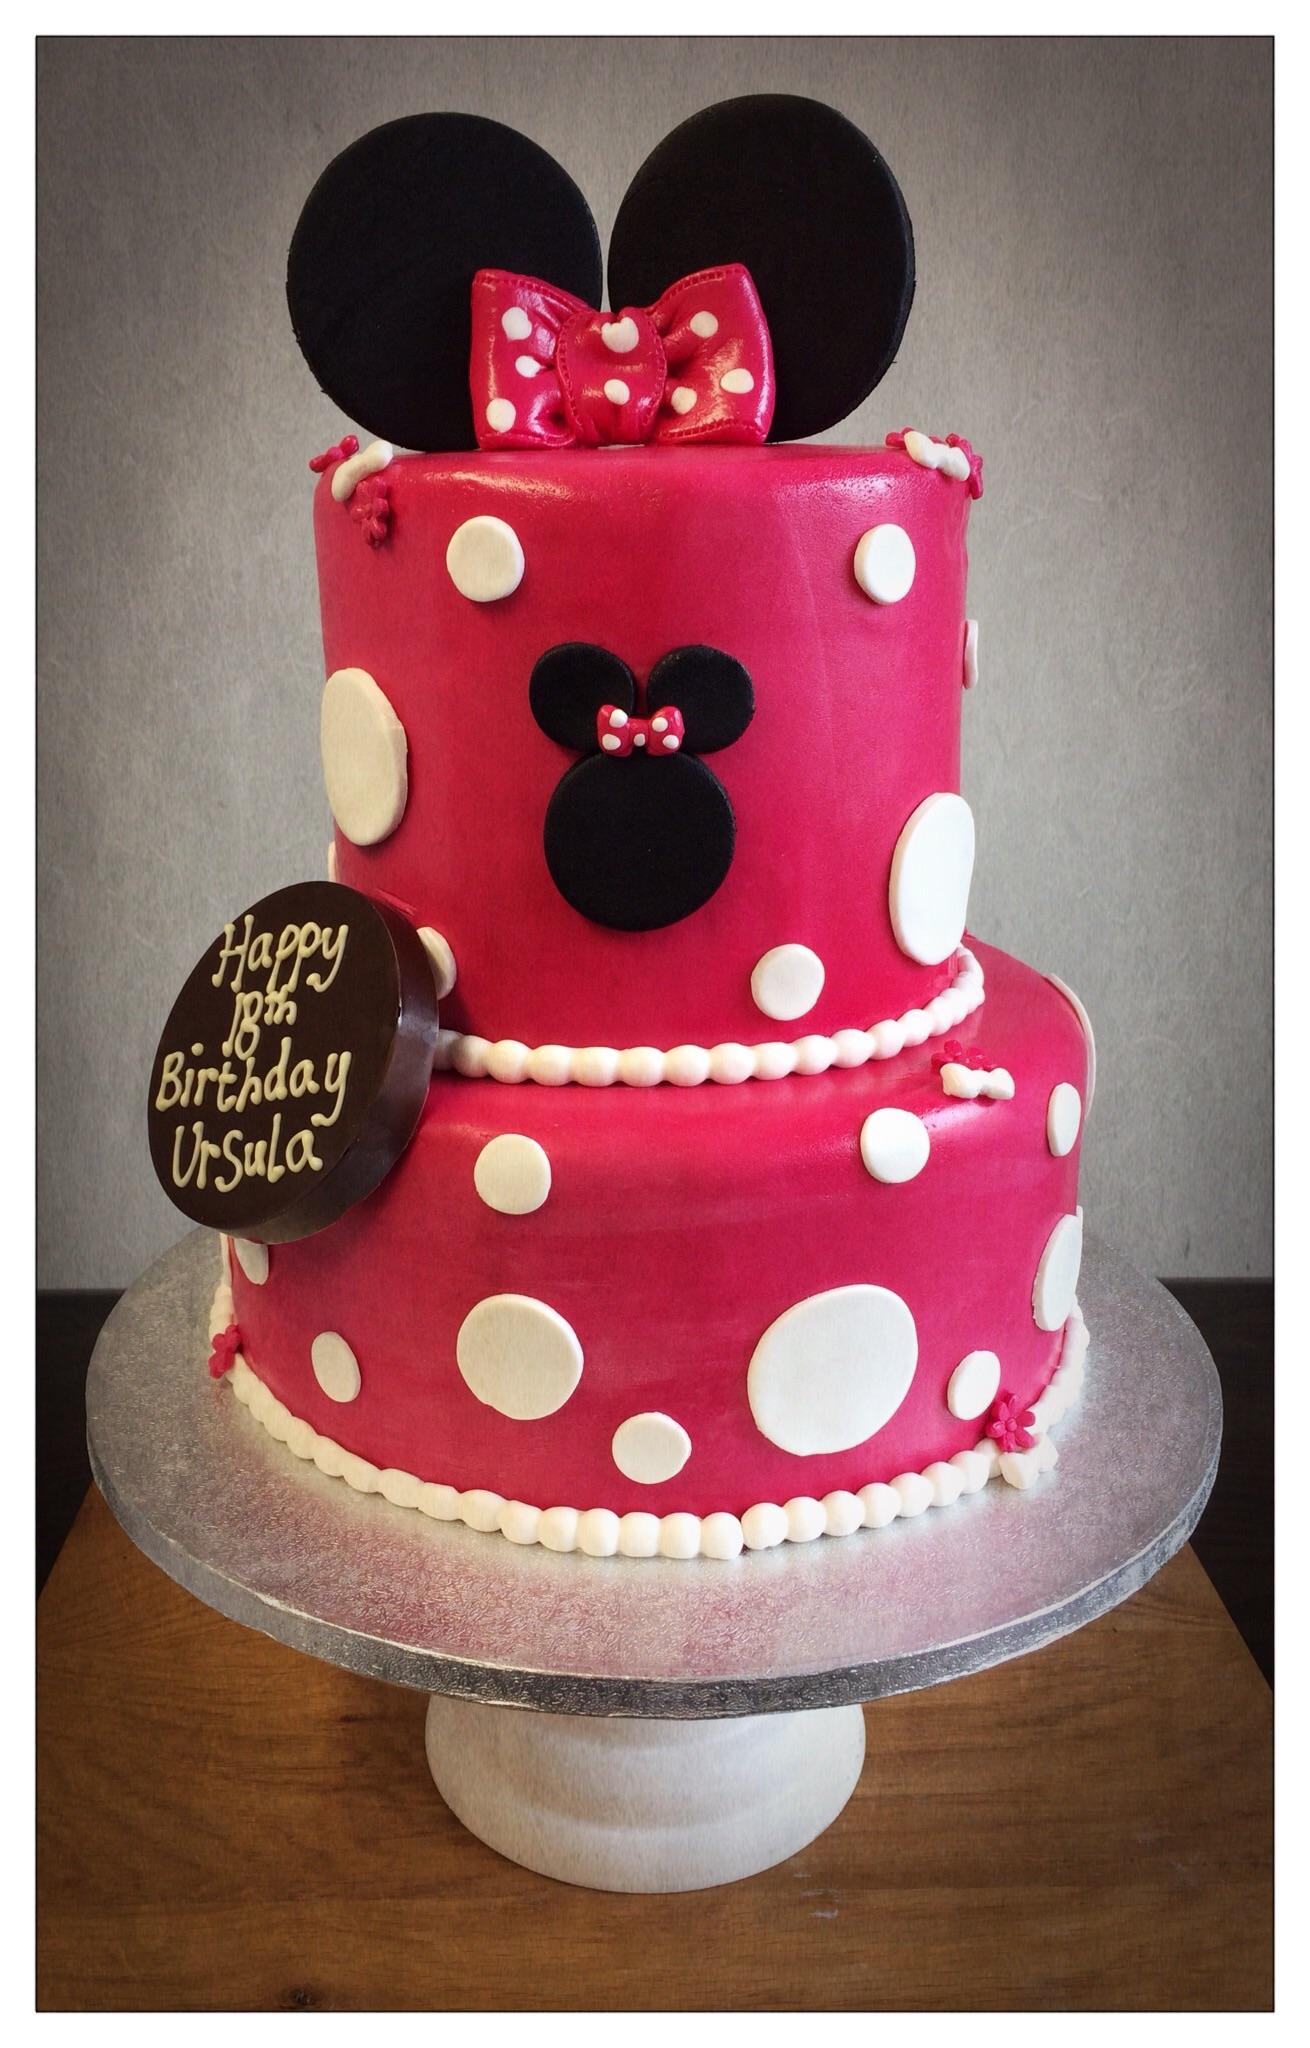 OCarrolls Cakes Killarney Ireland